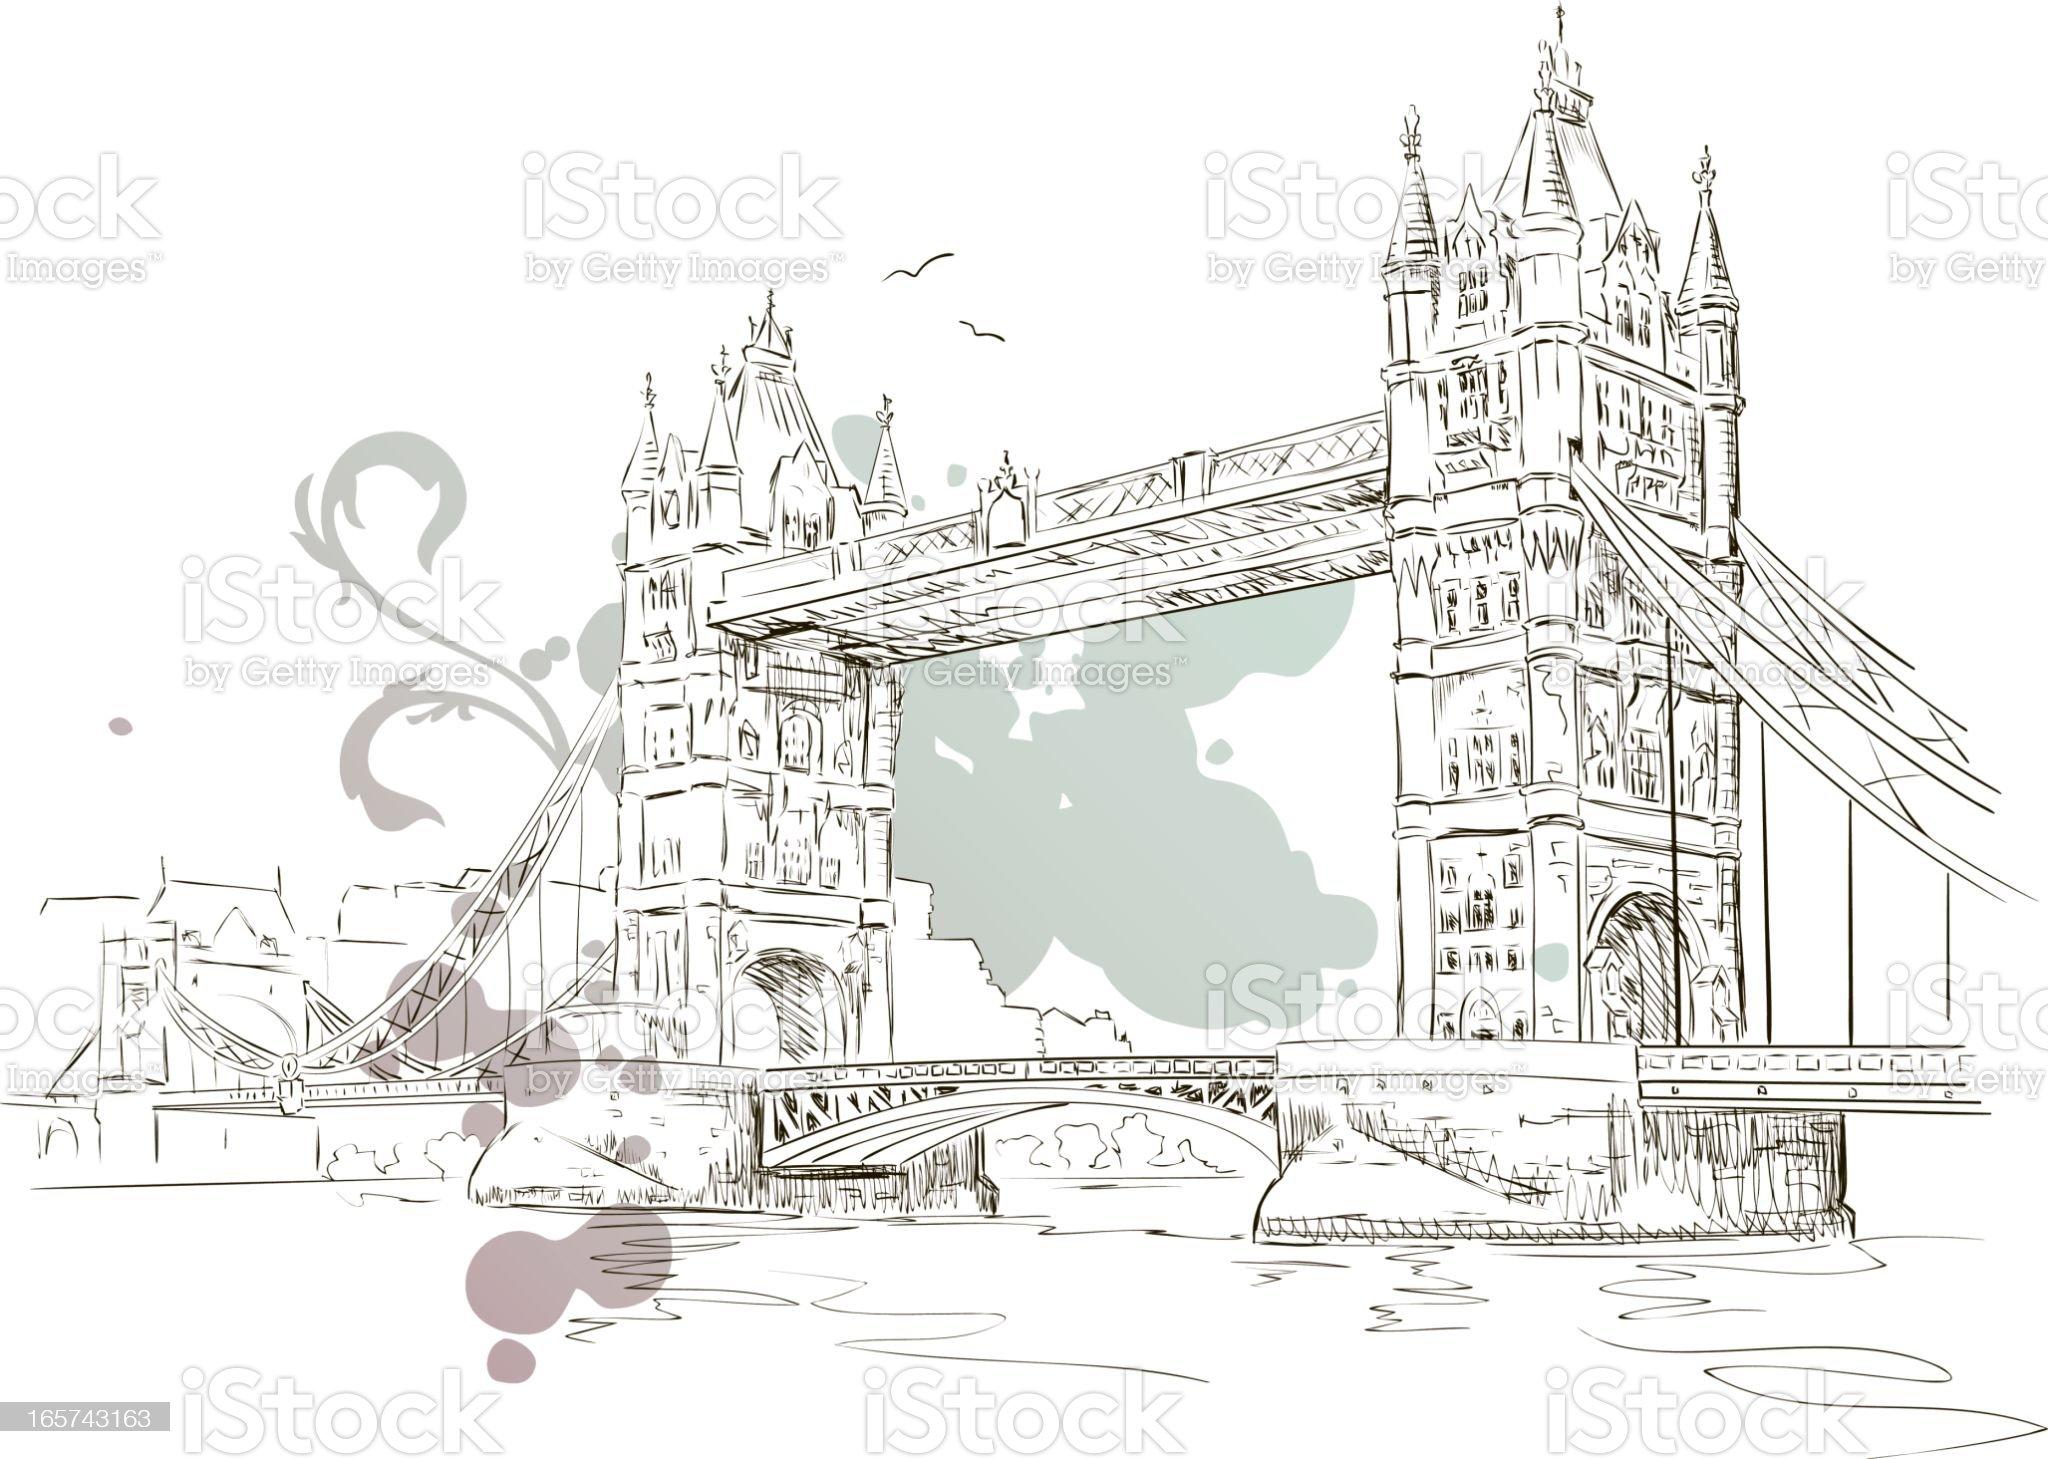 Tower Bridge Drawing royalty-free stock vector art